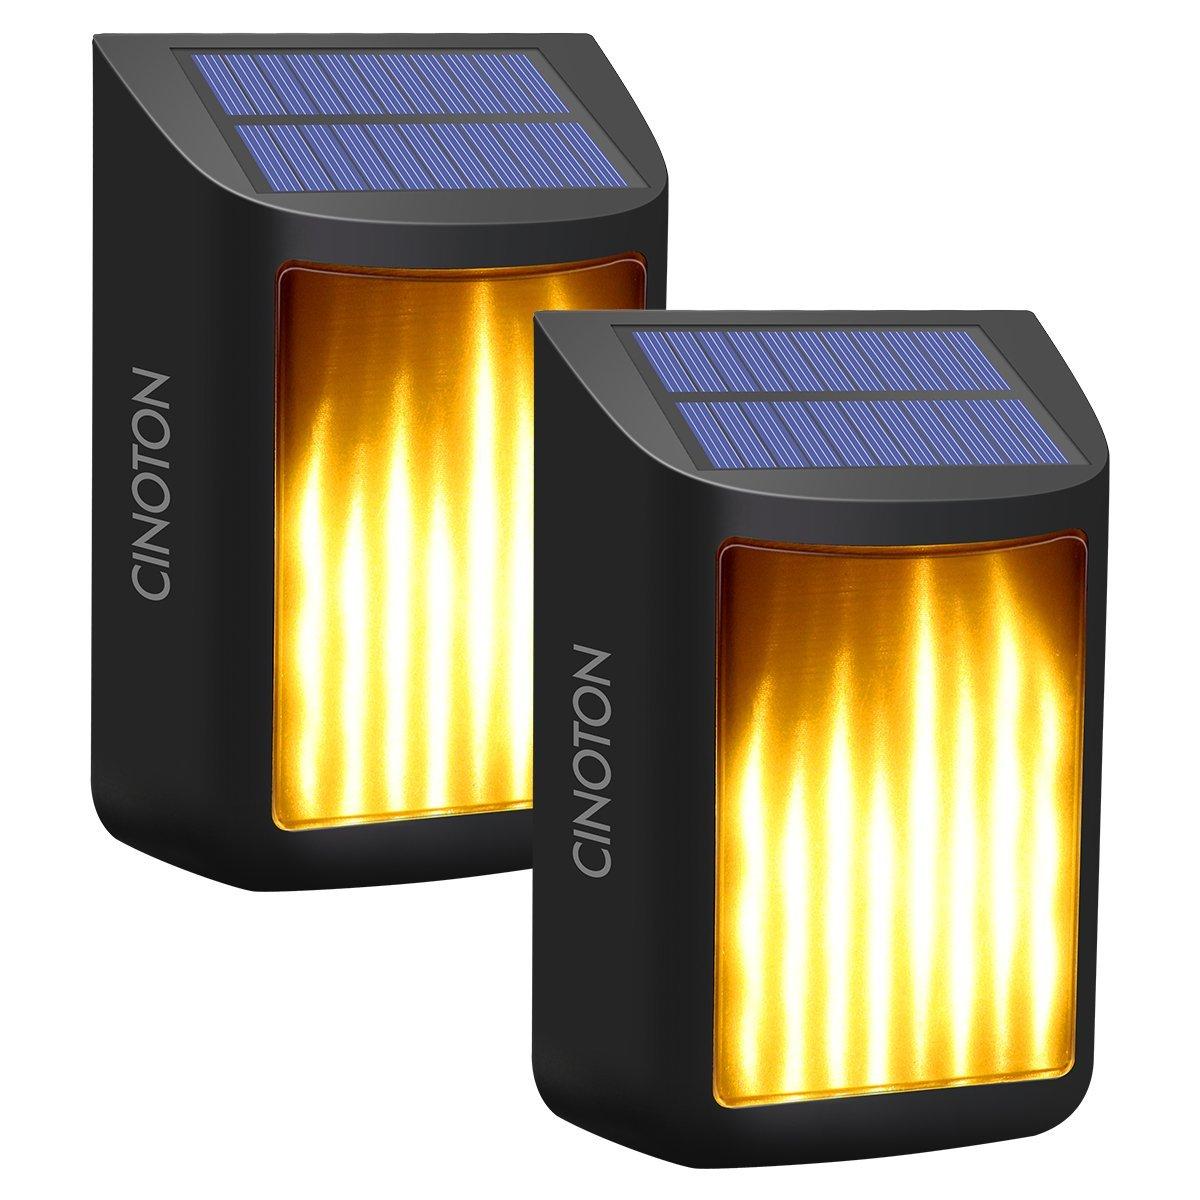 Amazon.com : CINOTON Solar Wall Lights, Waterproof Flickering Flame ...